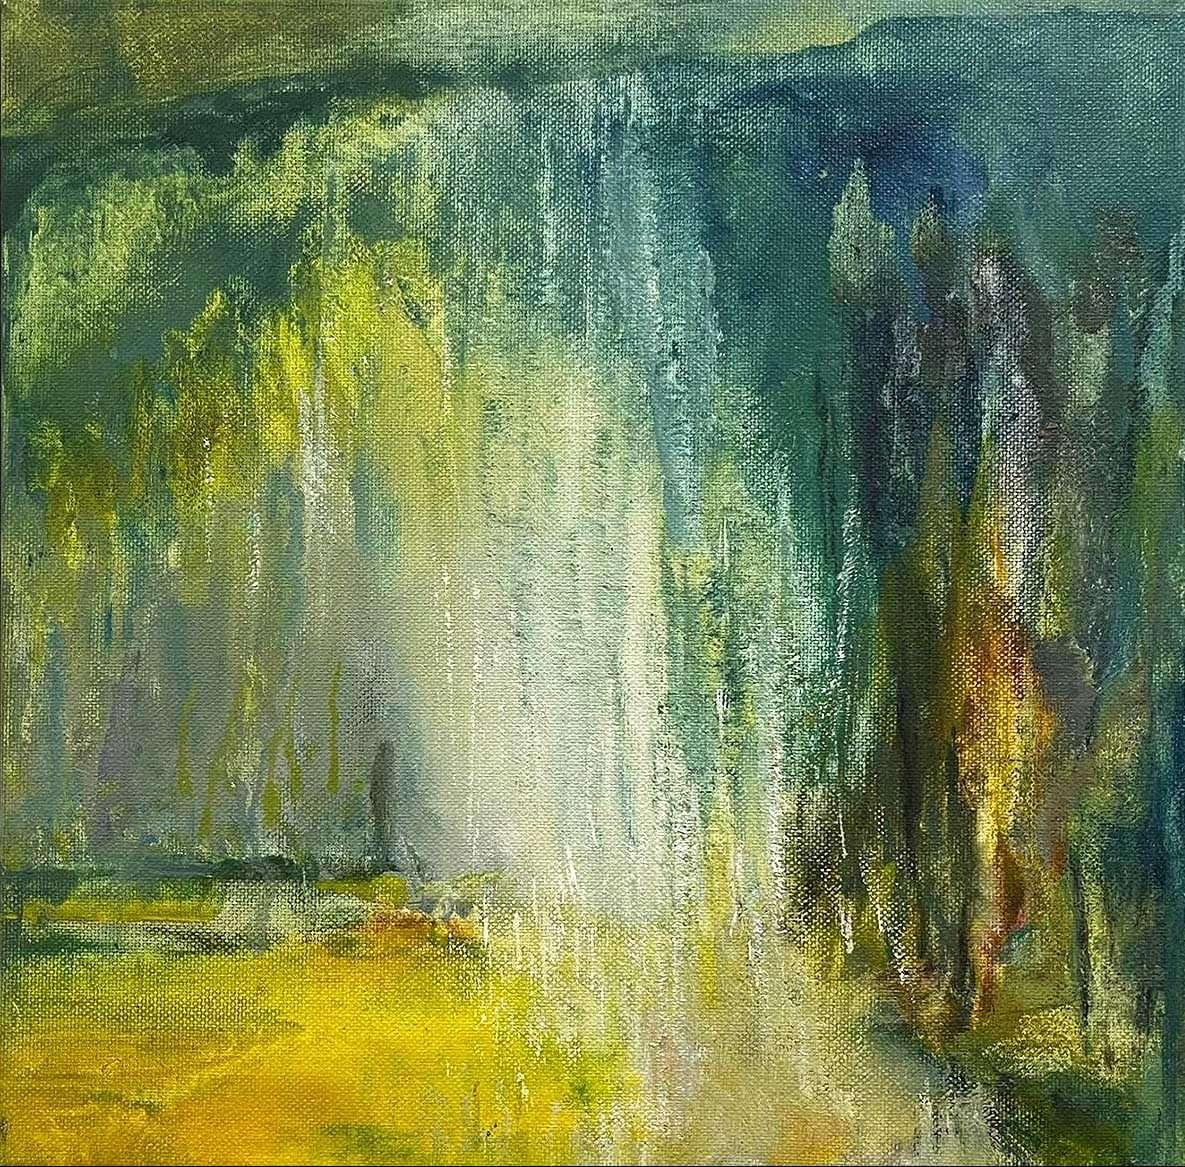 Sarah Knox, 'Waterfall', oil on canvas